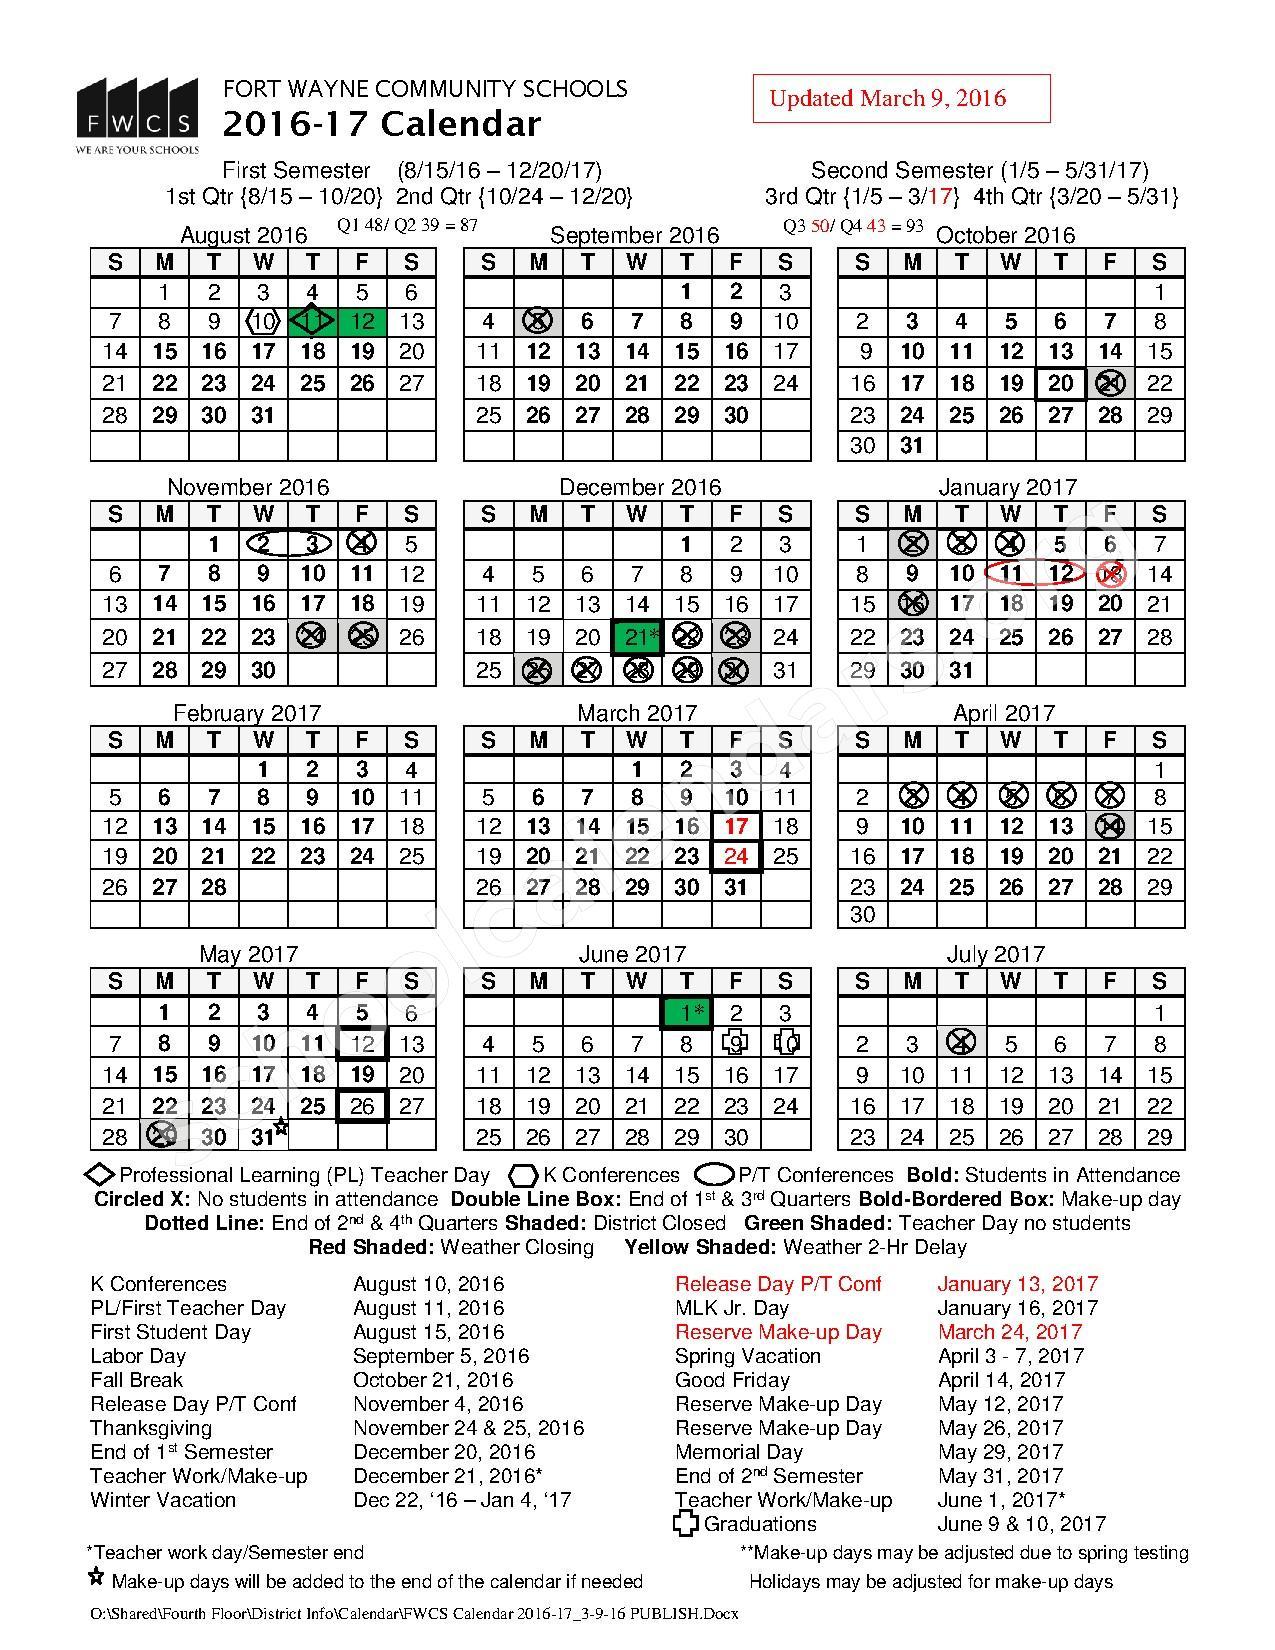 2016 - 2017 FWCS School Calendar – Fort Wayne Community Schools – page 1